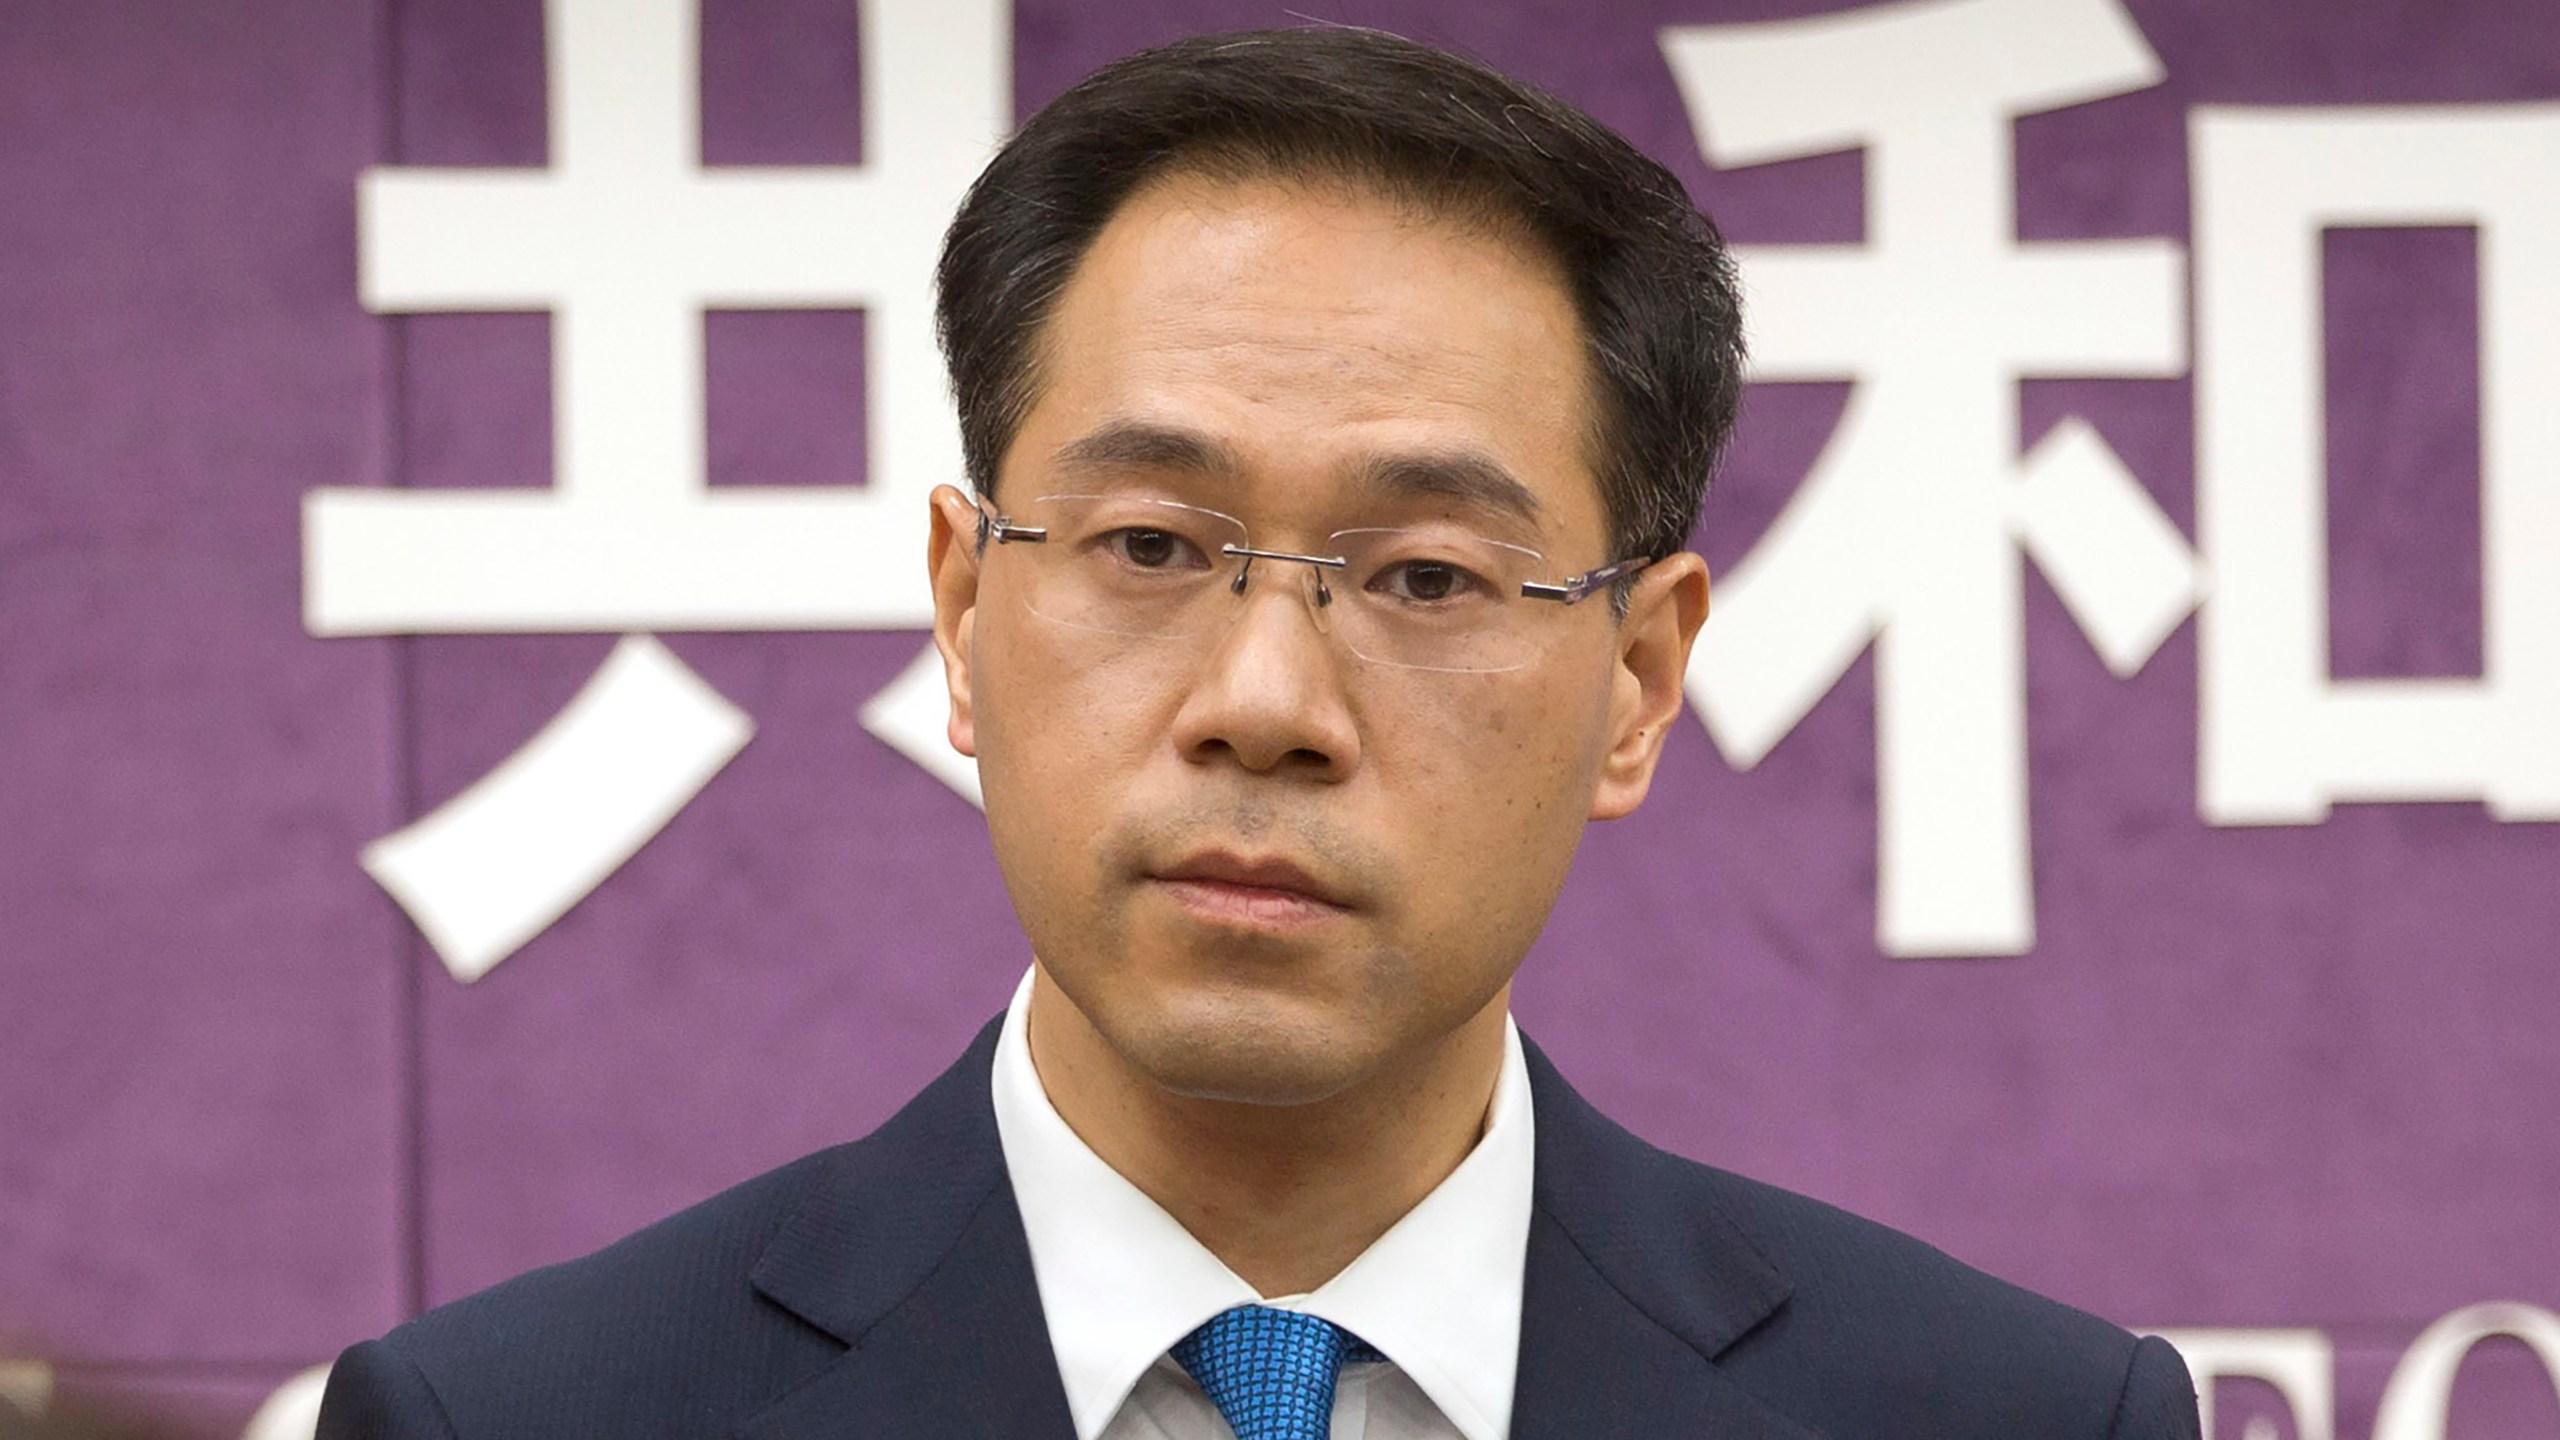 Gao Feng